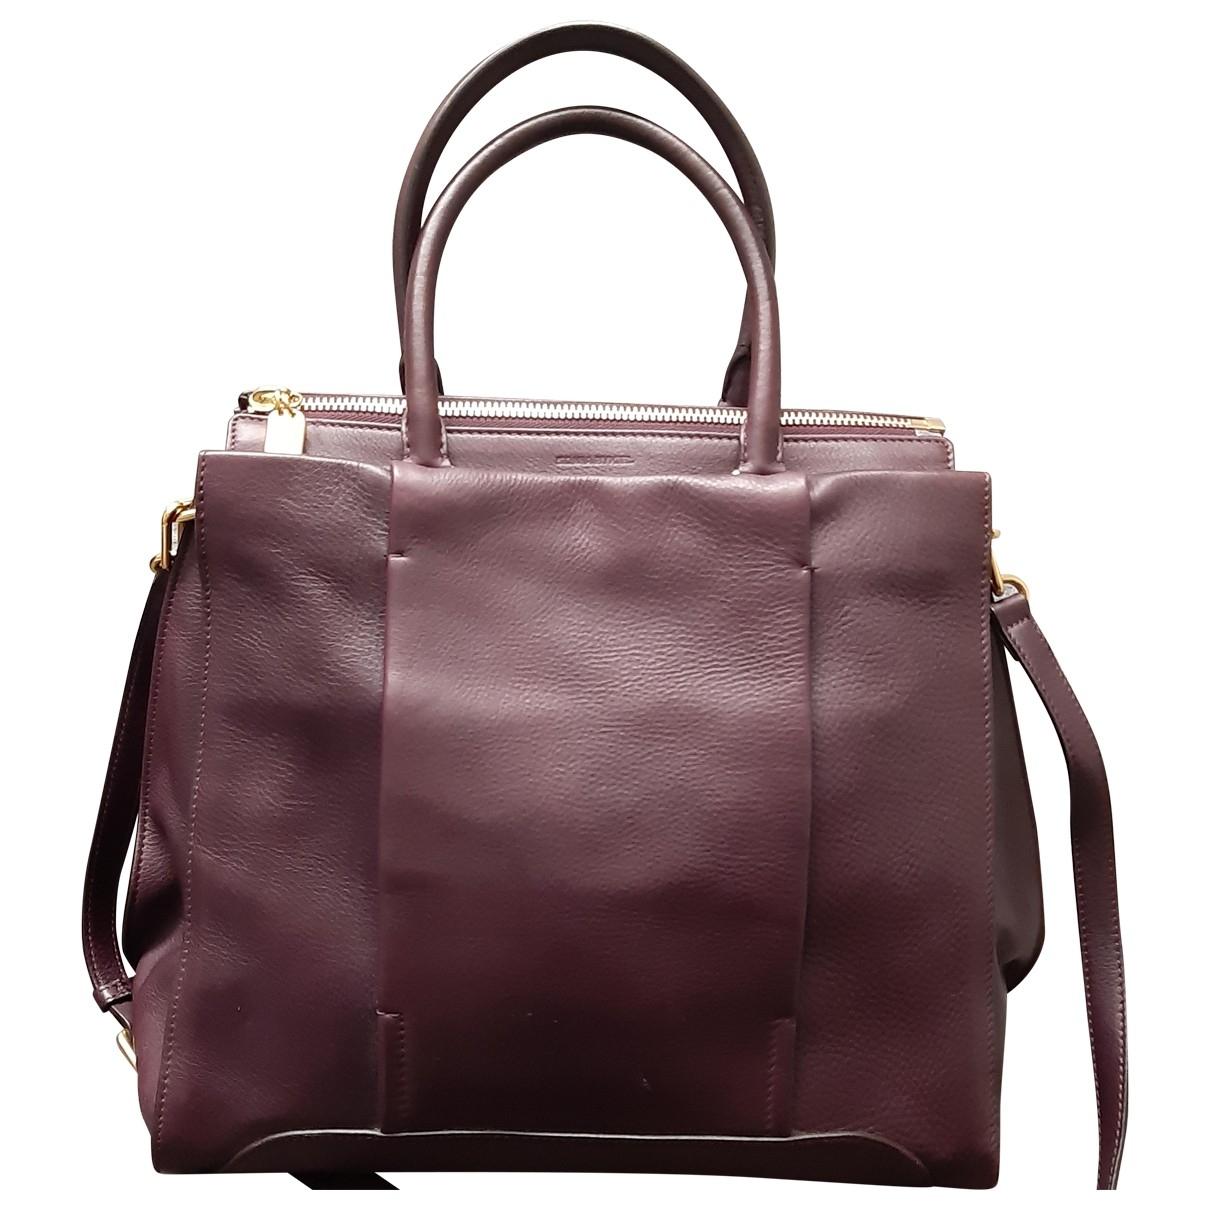 Sonia Rykiel \N Burgundy Leather handbag for Women \N